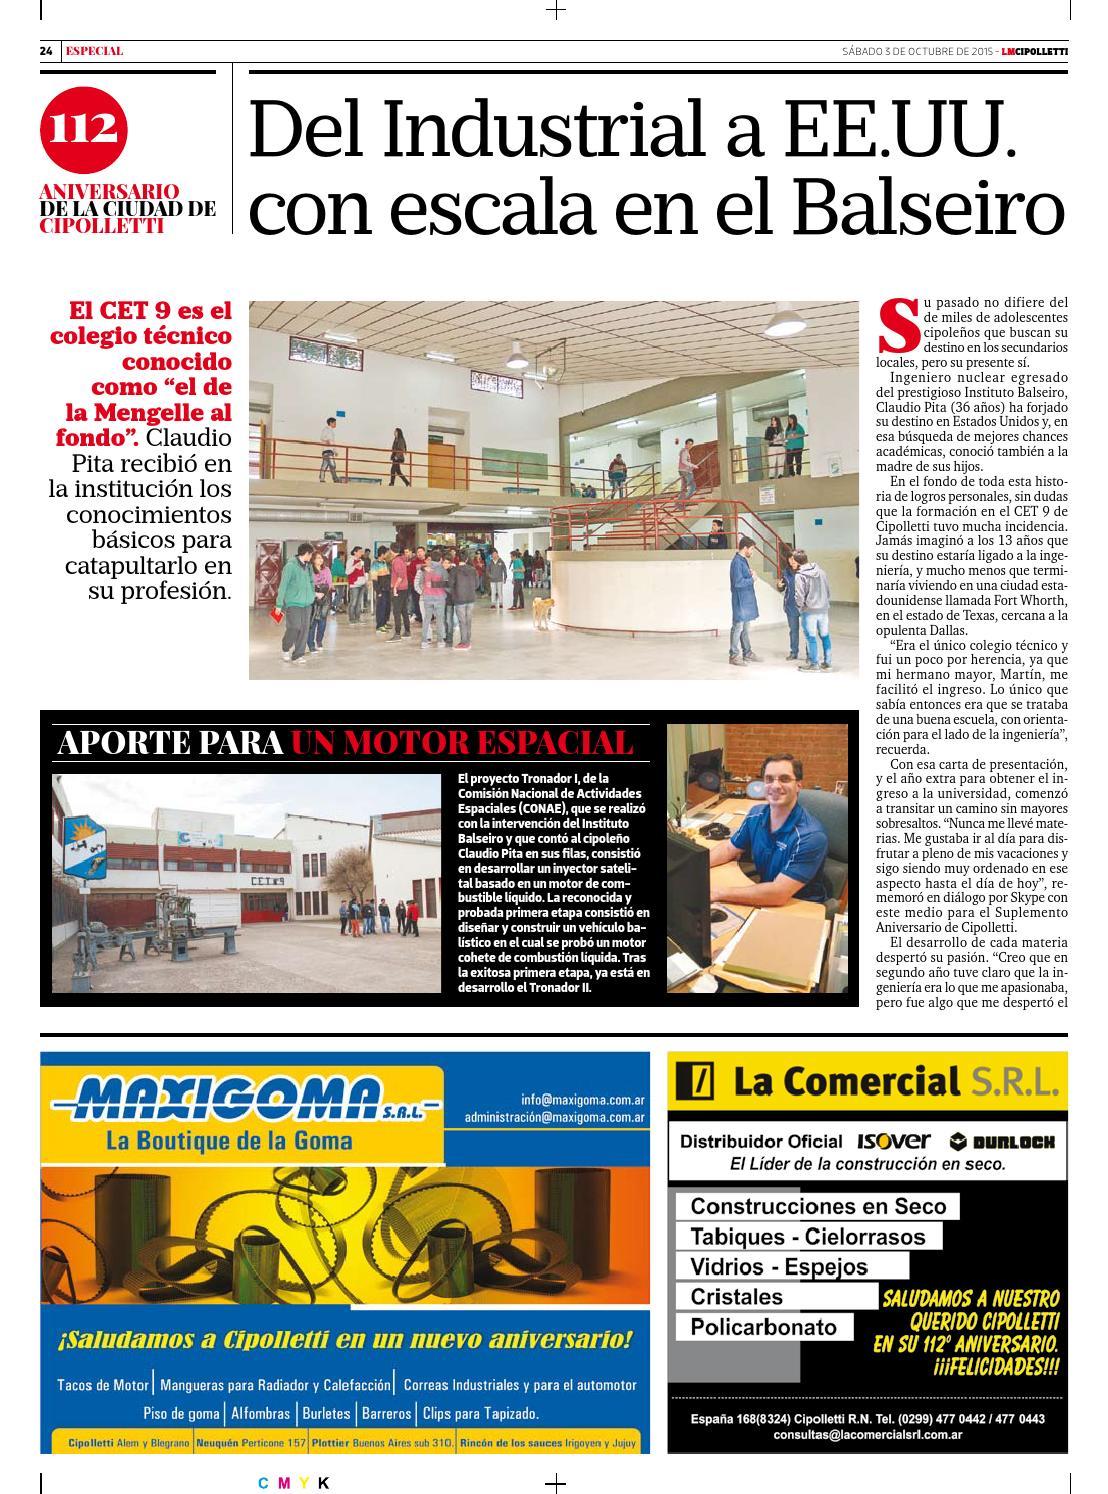 Suplemento 112 aniversario cipolletti 2015 10 03 by Diario